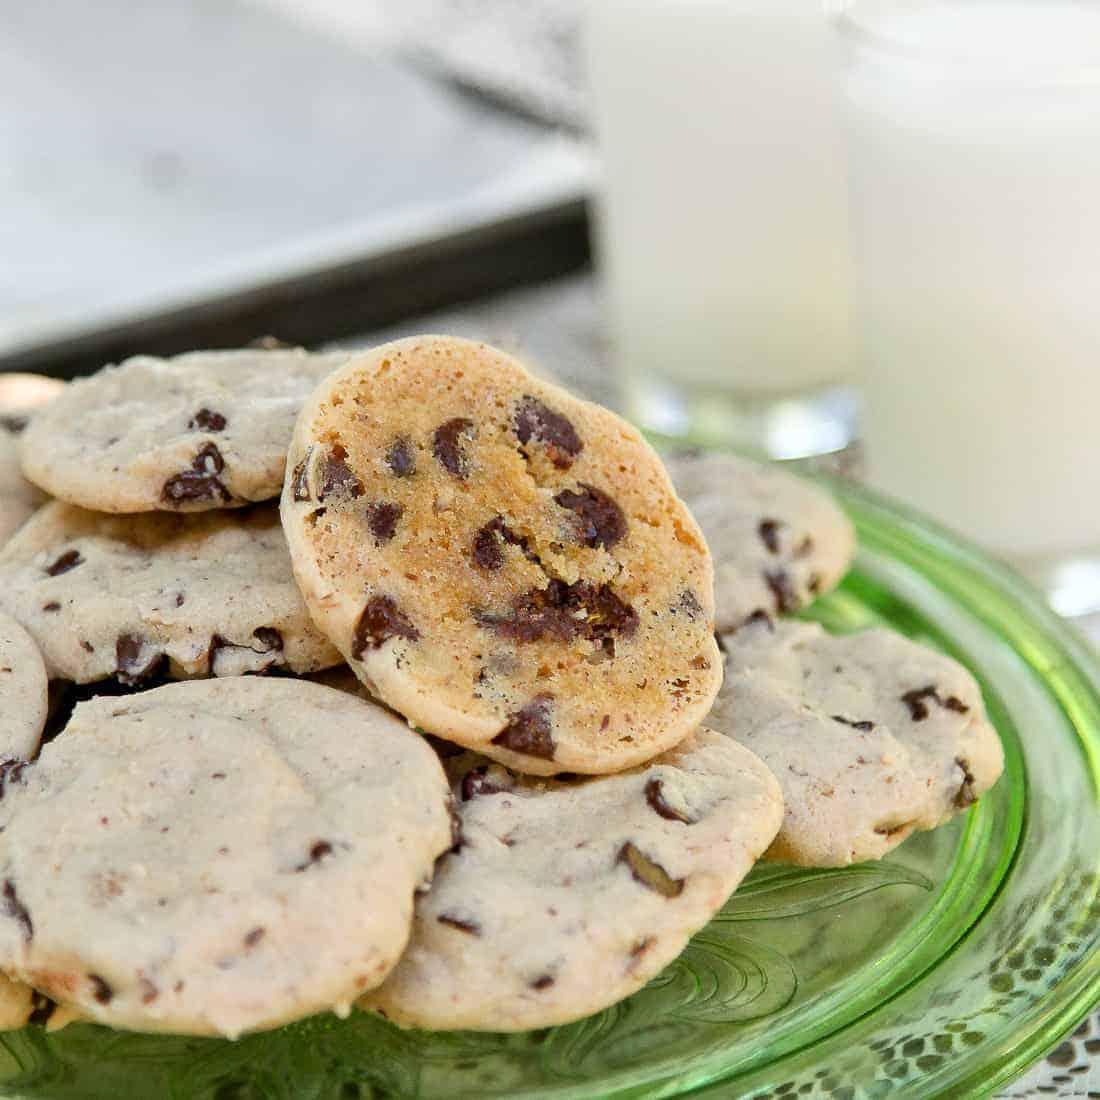 Dashboard chocolate chip cookies - Gluten Free